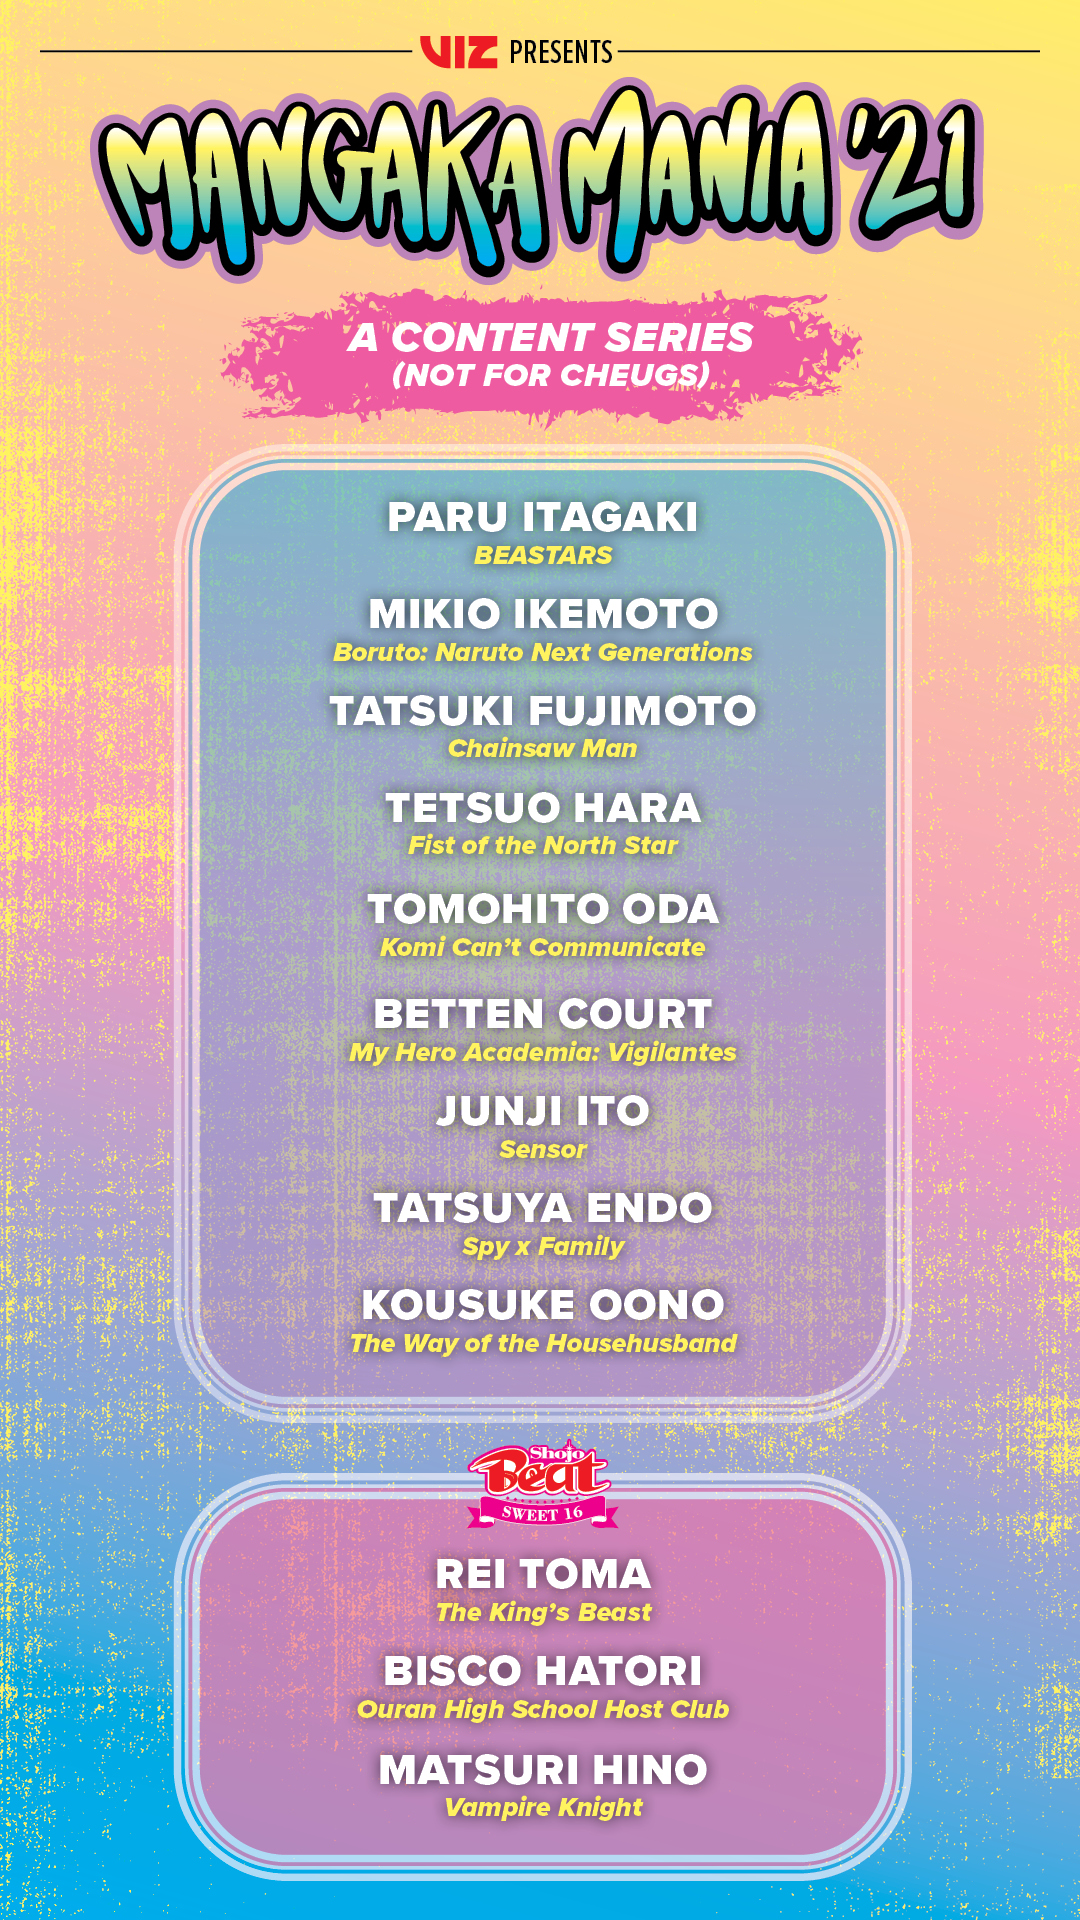 Mangaka Mania21 1080x1920 Aug04 Final